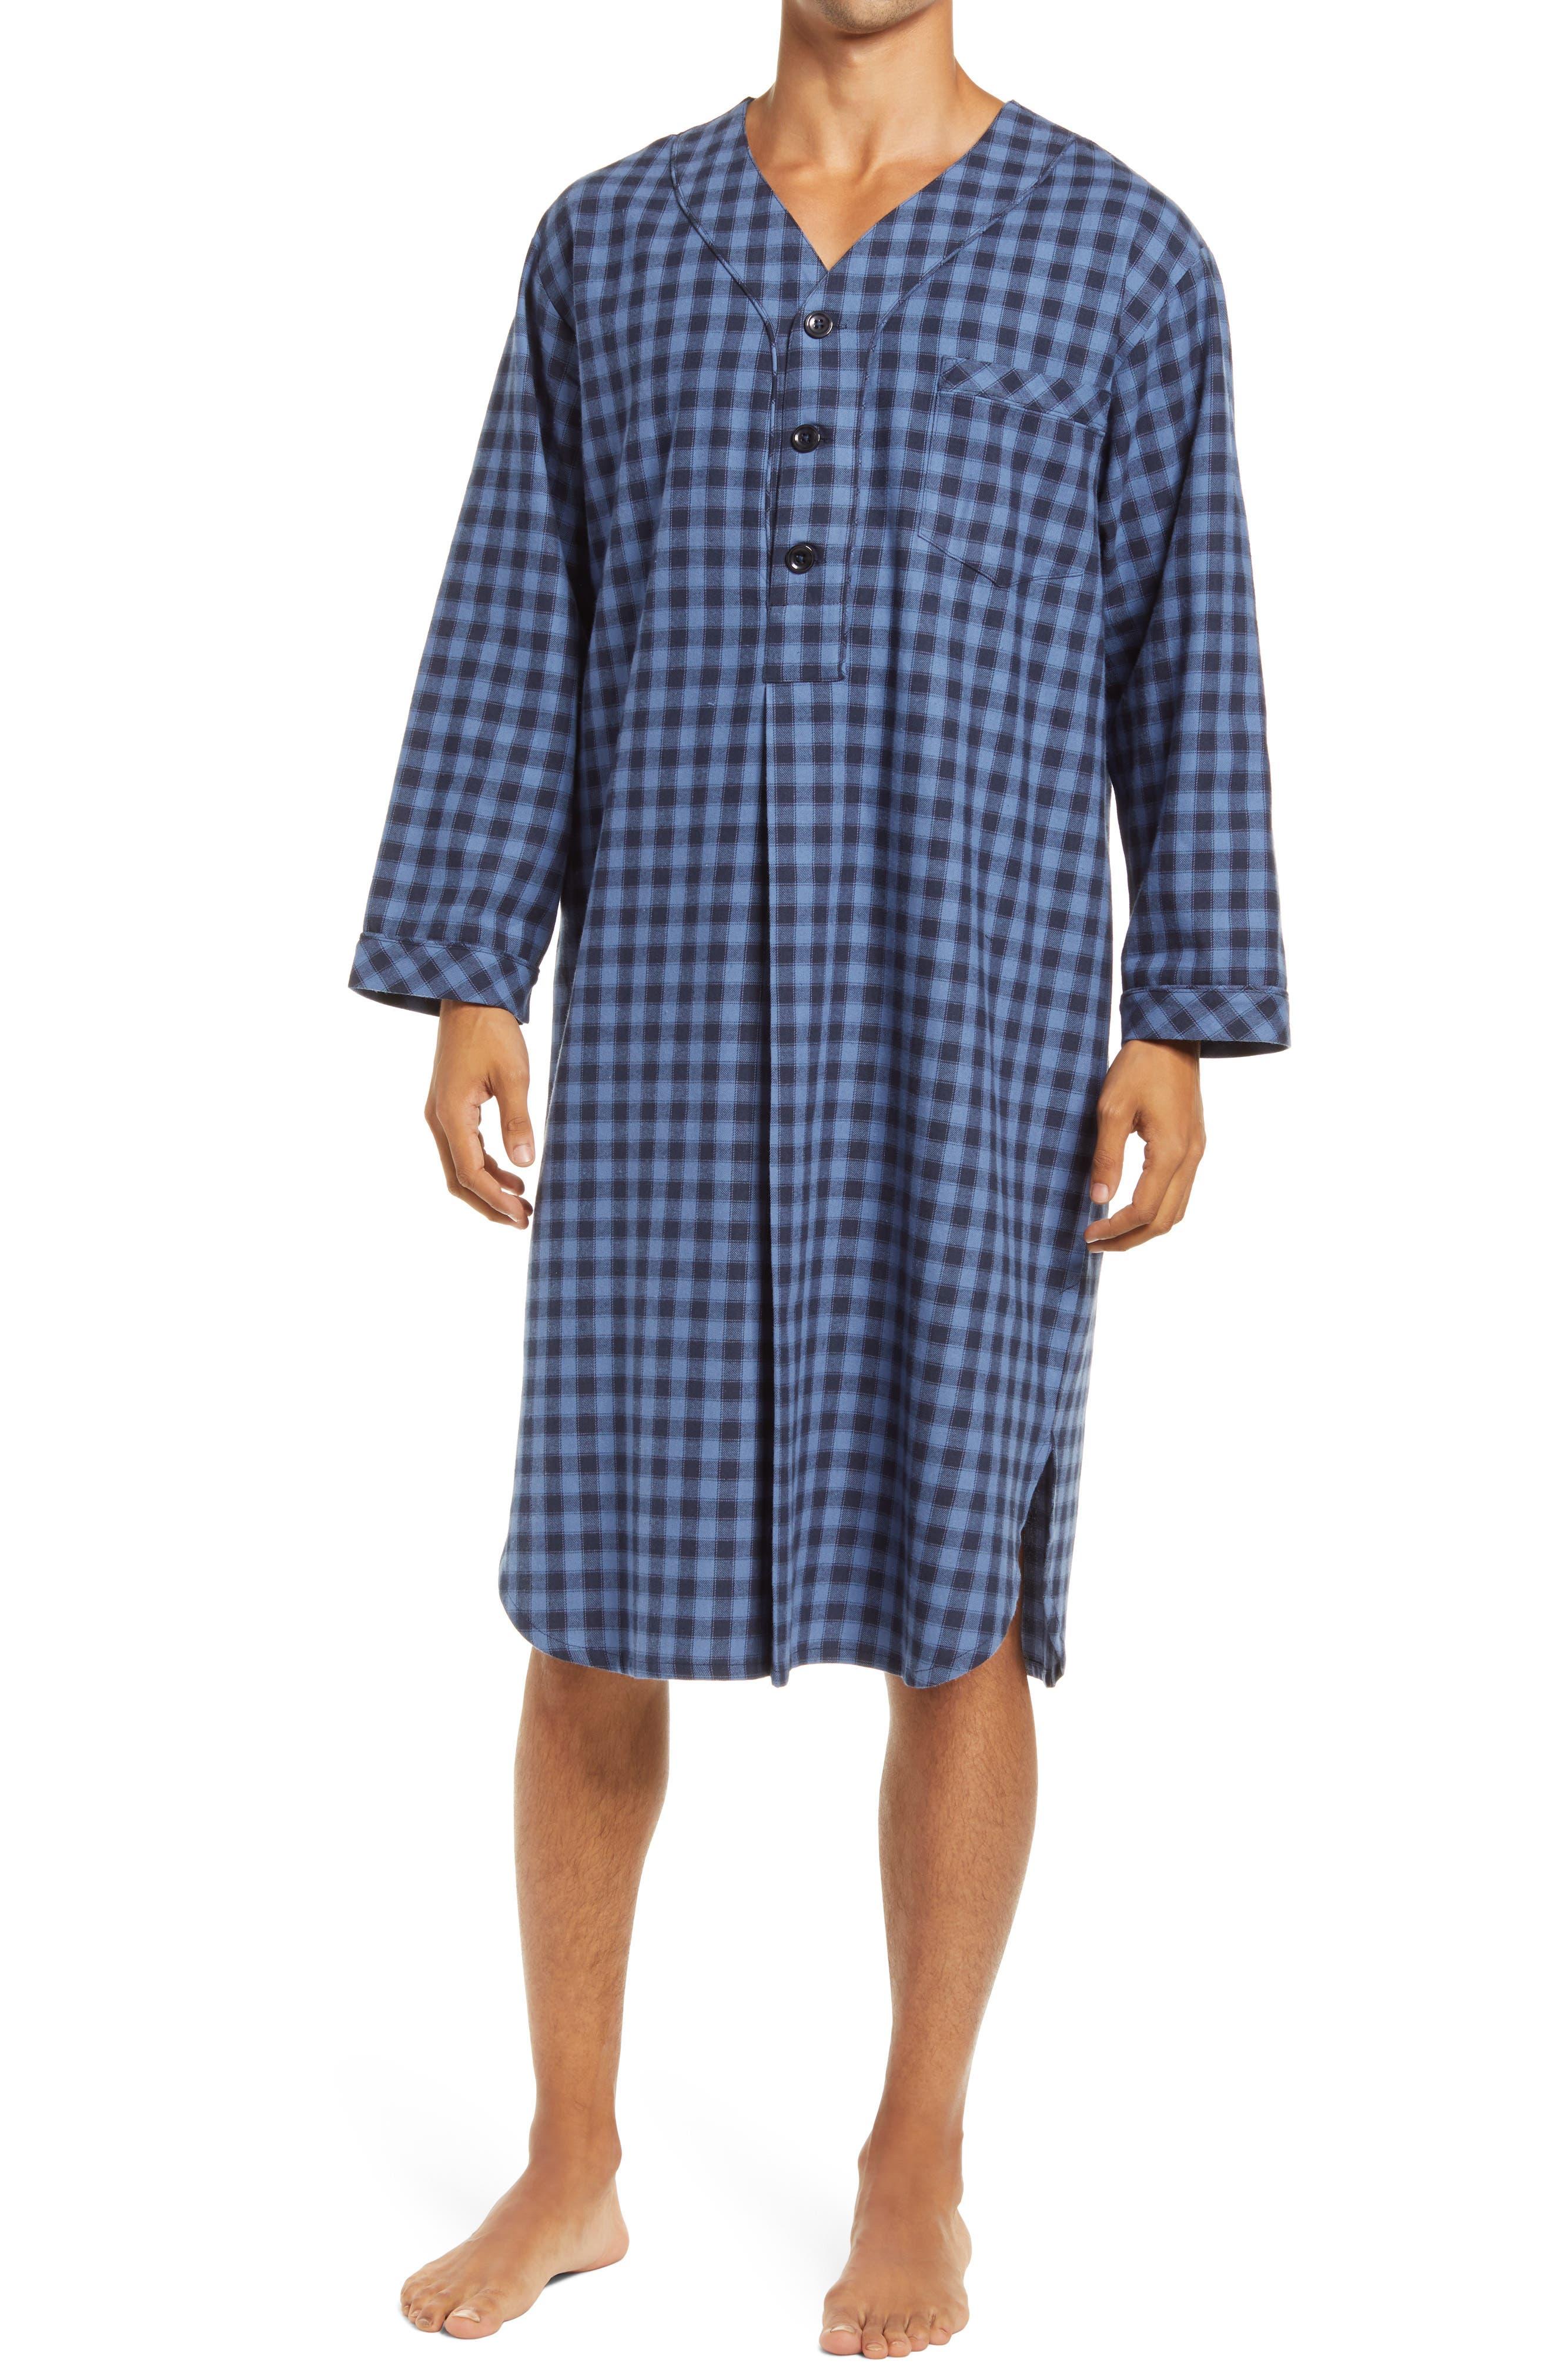 1940s Men's Underwear: Briefs, Boxers, Unions, & Socks Mens Majestic International Flannel Nightshirt Size SmallMedium - Blue $70.00 AT vintagedancer.com